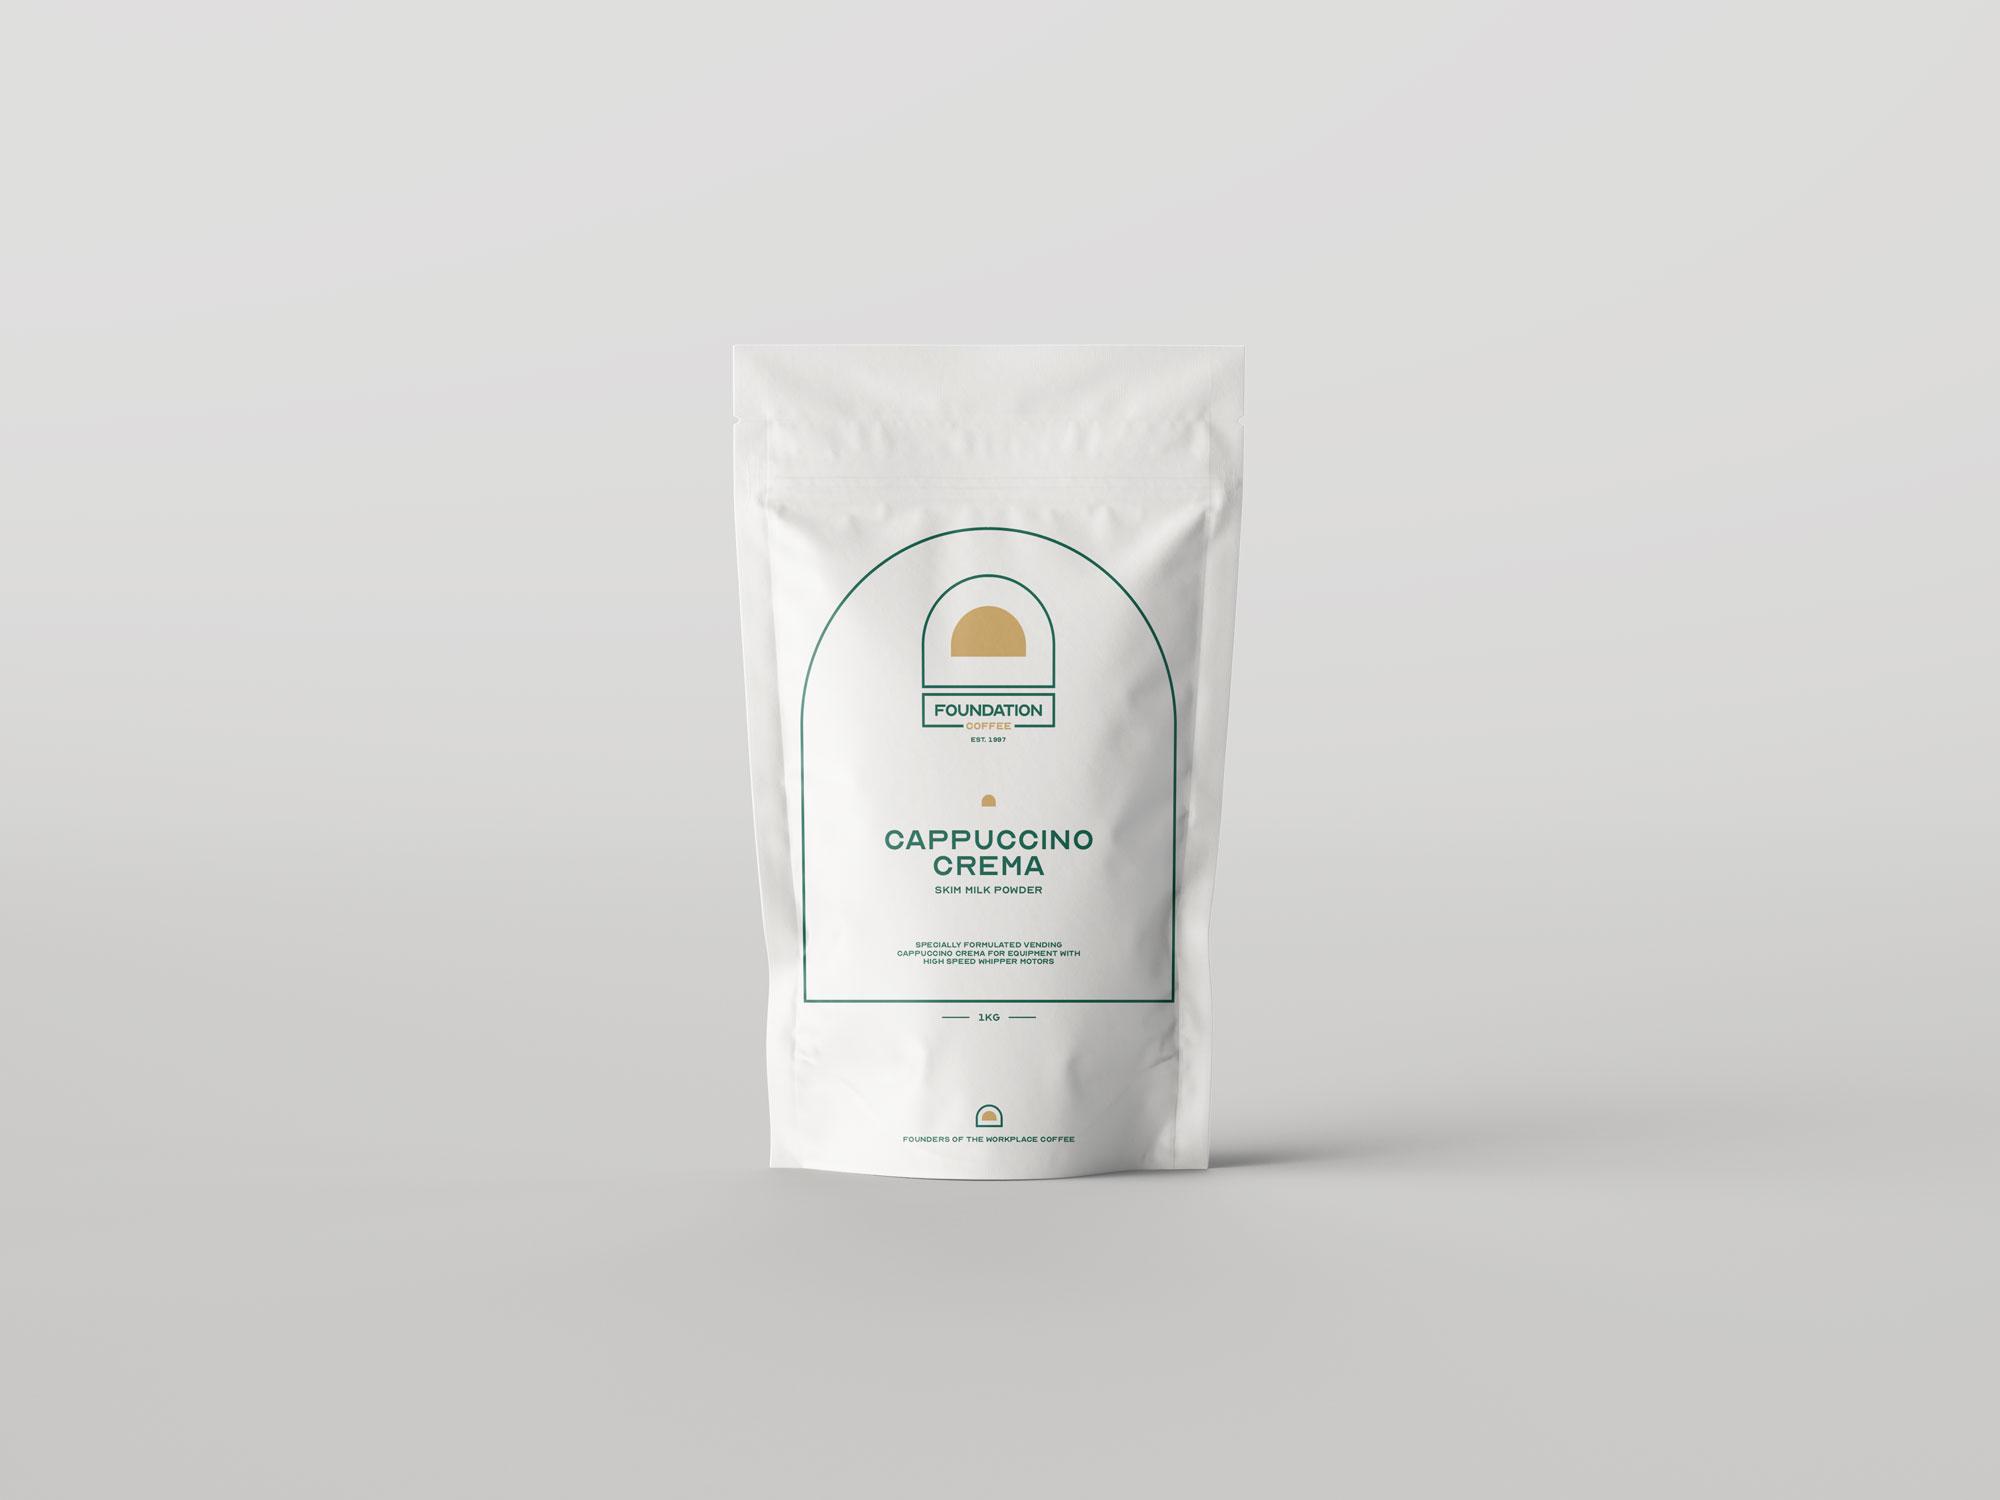 Cappuccino-crema—Front